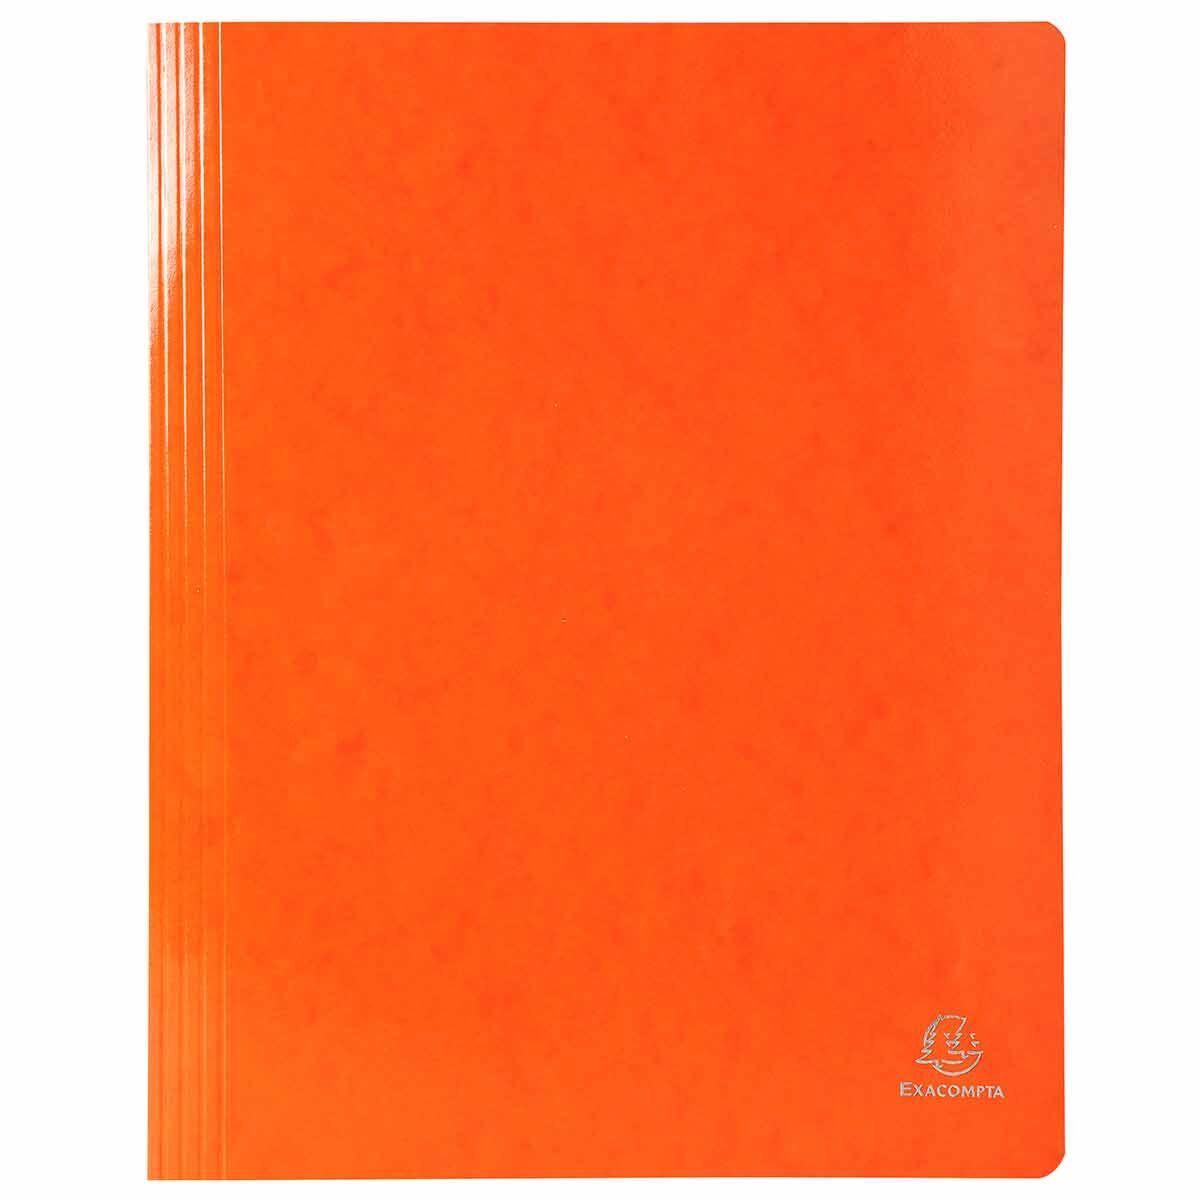 Exacompta Iderama Flat Bar Files Flat A4 Pack of 25 355gsm Orange